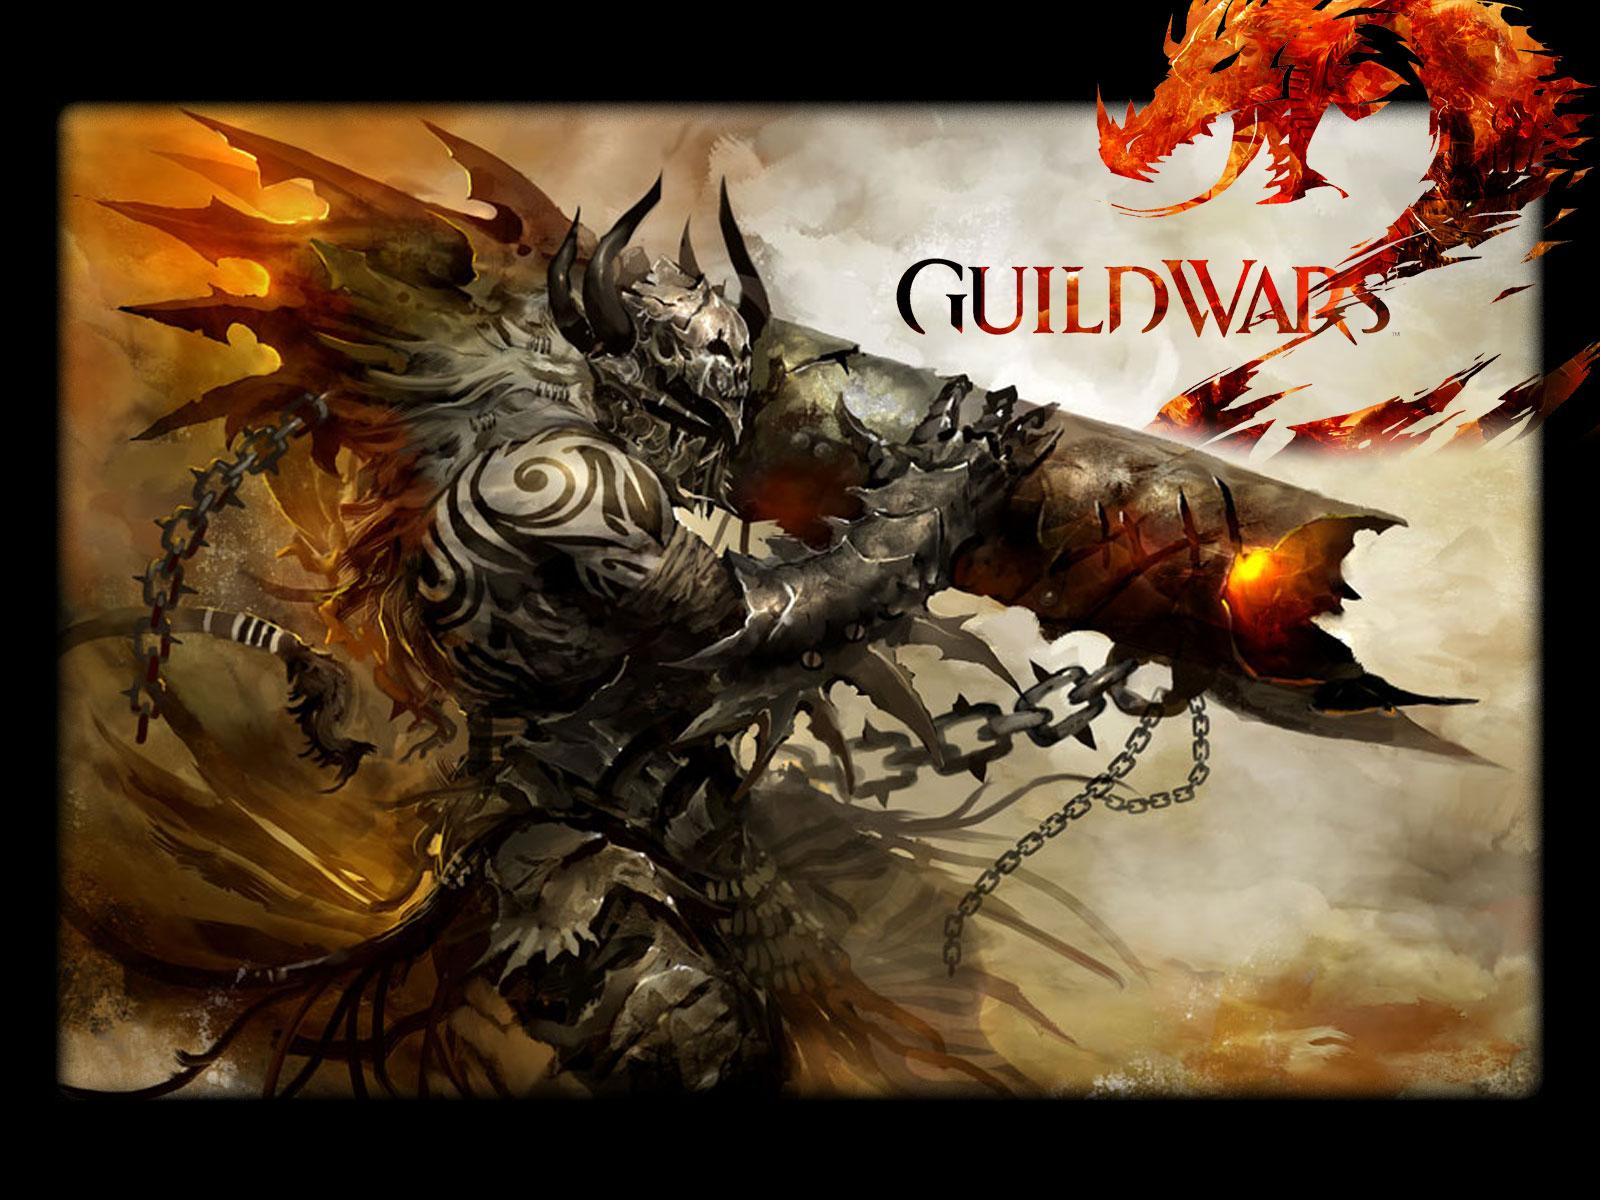 http://1.bp.blogspot.com/-IkypneLOTFo/UMXw3tfFUDI/AAAAAAAAEG8/zWdRtWL23H4/s1600/guild-wars-2-pic4.jpg